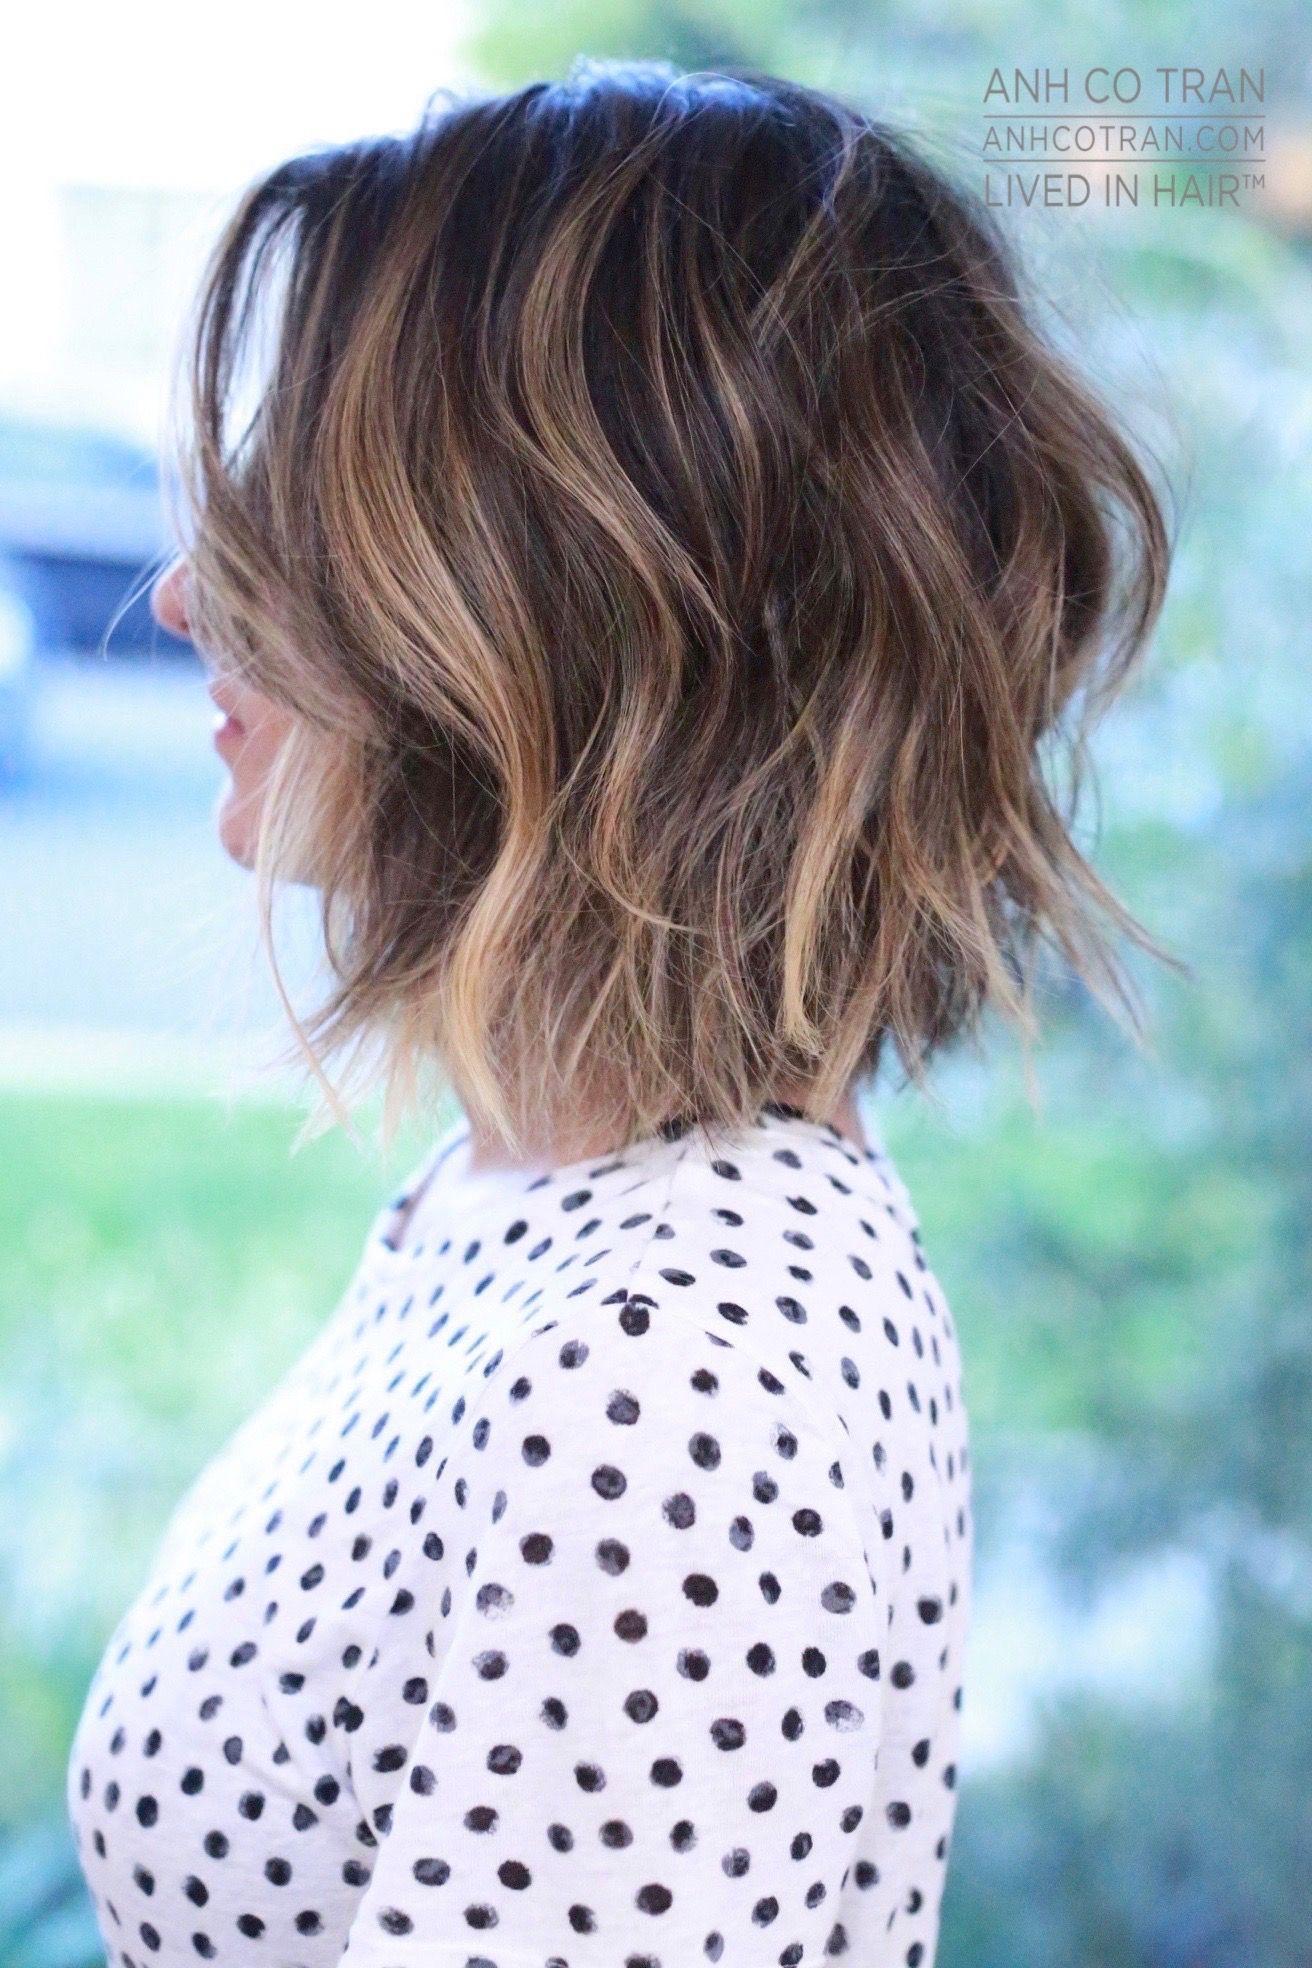 Pin By Valerie Duke On My Style Pinterest Hair Cuts Hair Style